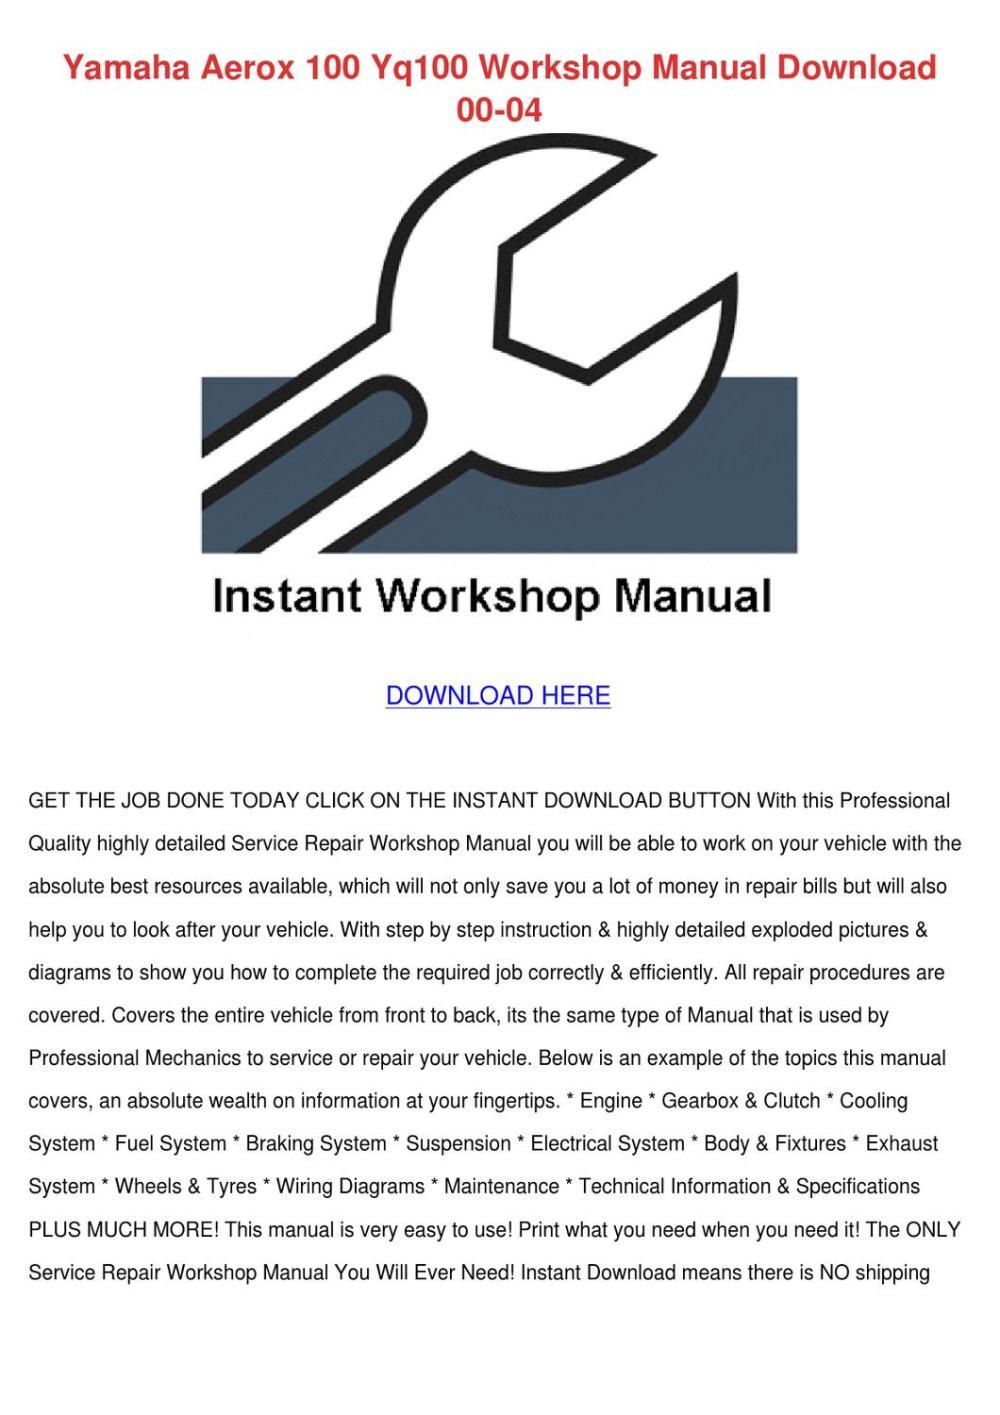 medium resolution of page 1 yamaha aerox 100 yq100 workshop manual downlo by willette galbavy yamaha aerox